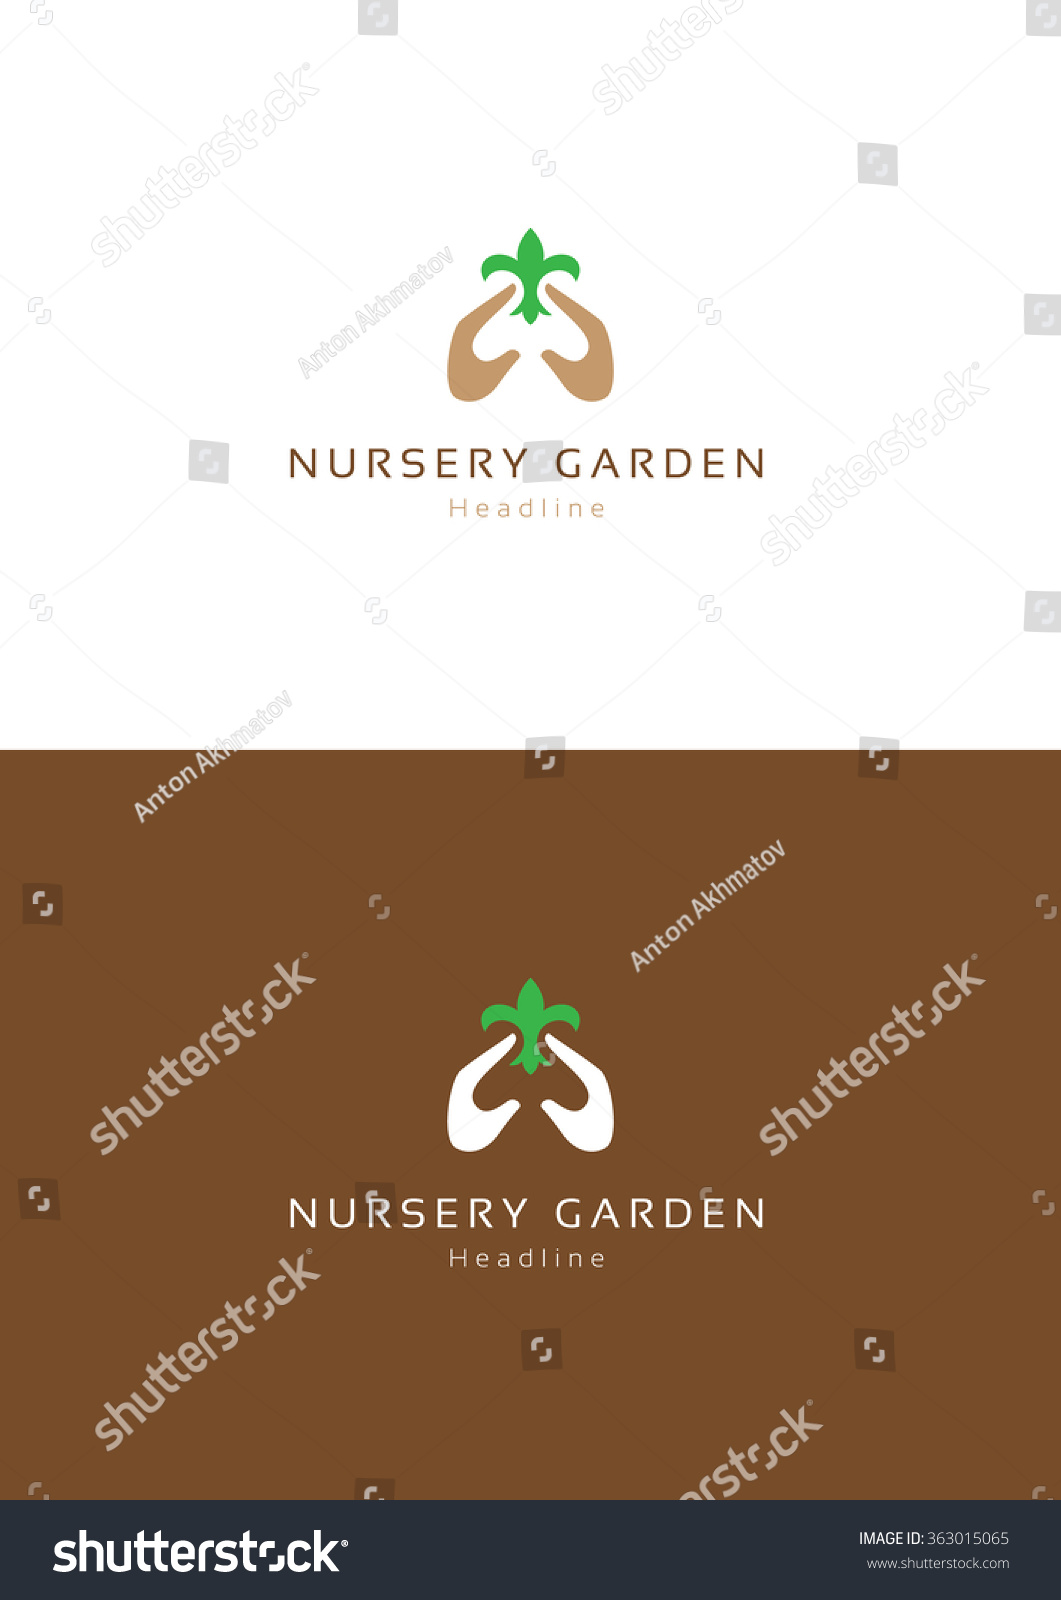 Nursery Garden Logo Template Stock Vector 363015065 - Shutterstock